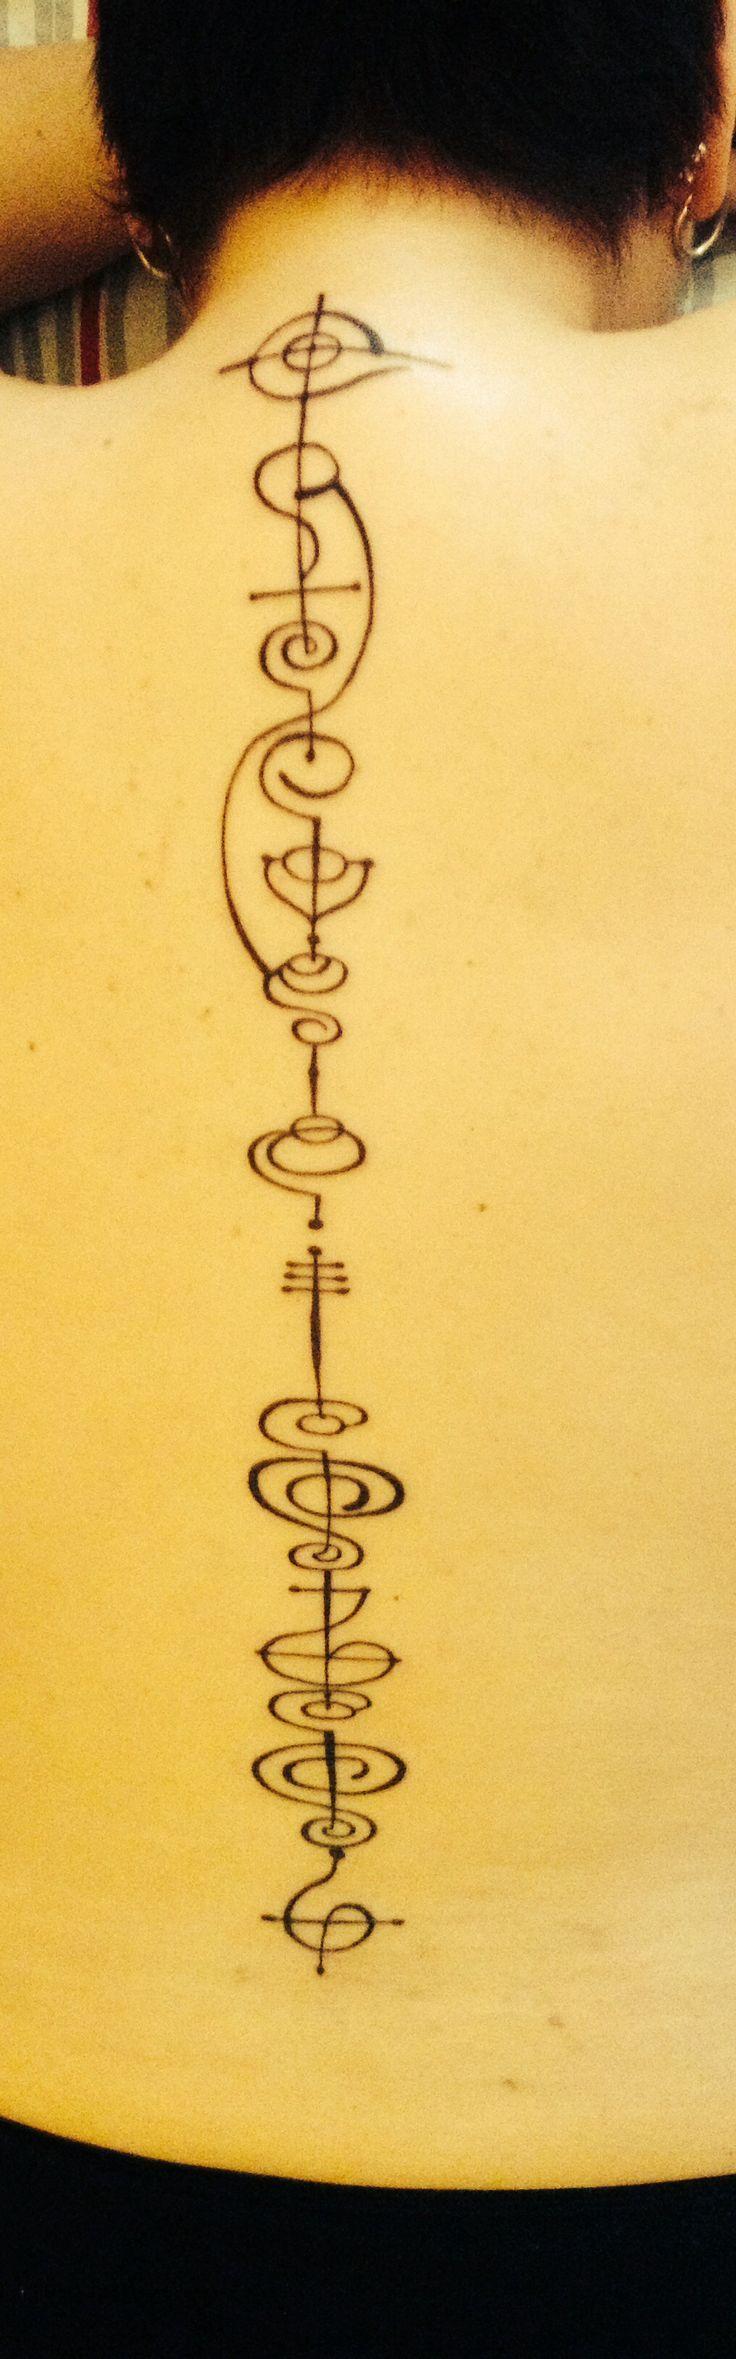 best tattoos images on pinterest clock tattoos tattoo designs